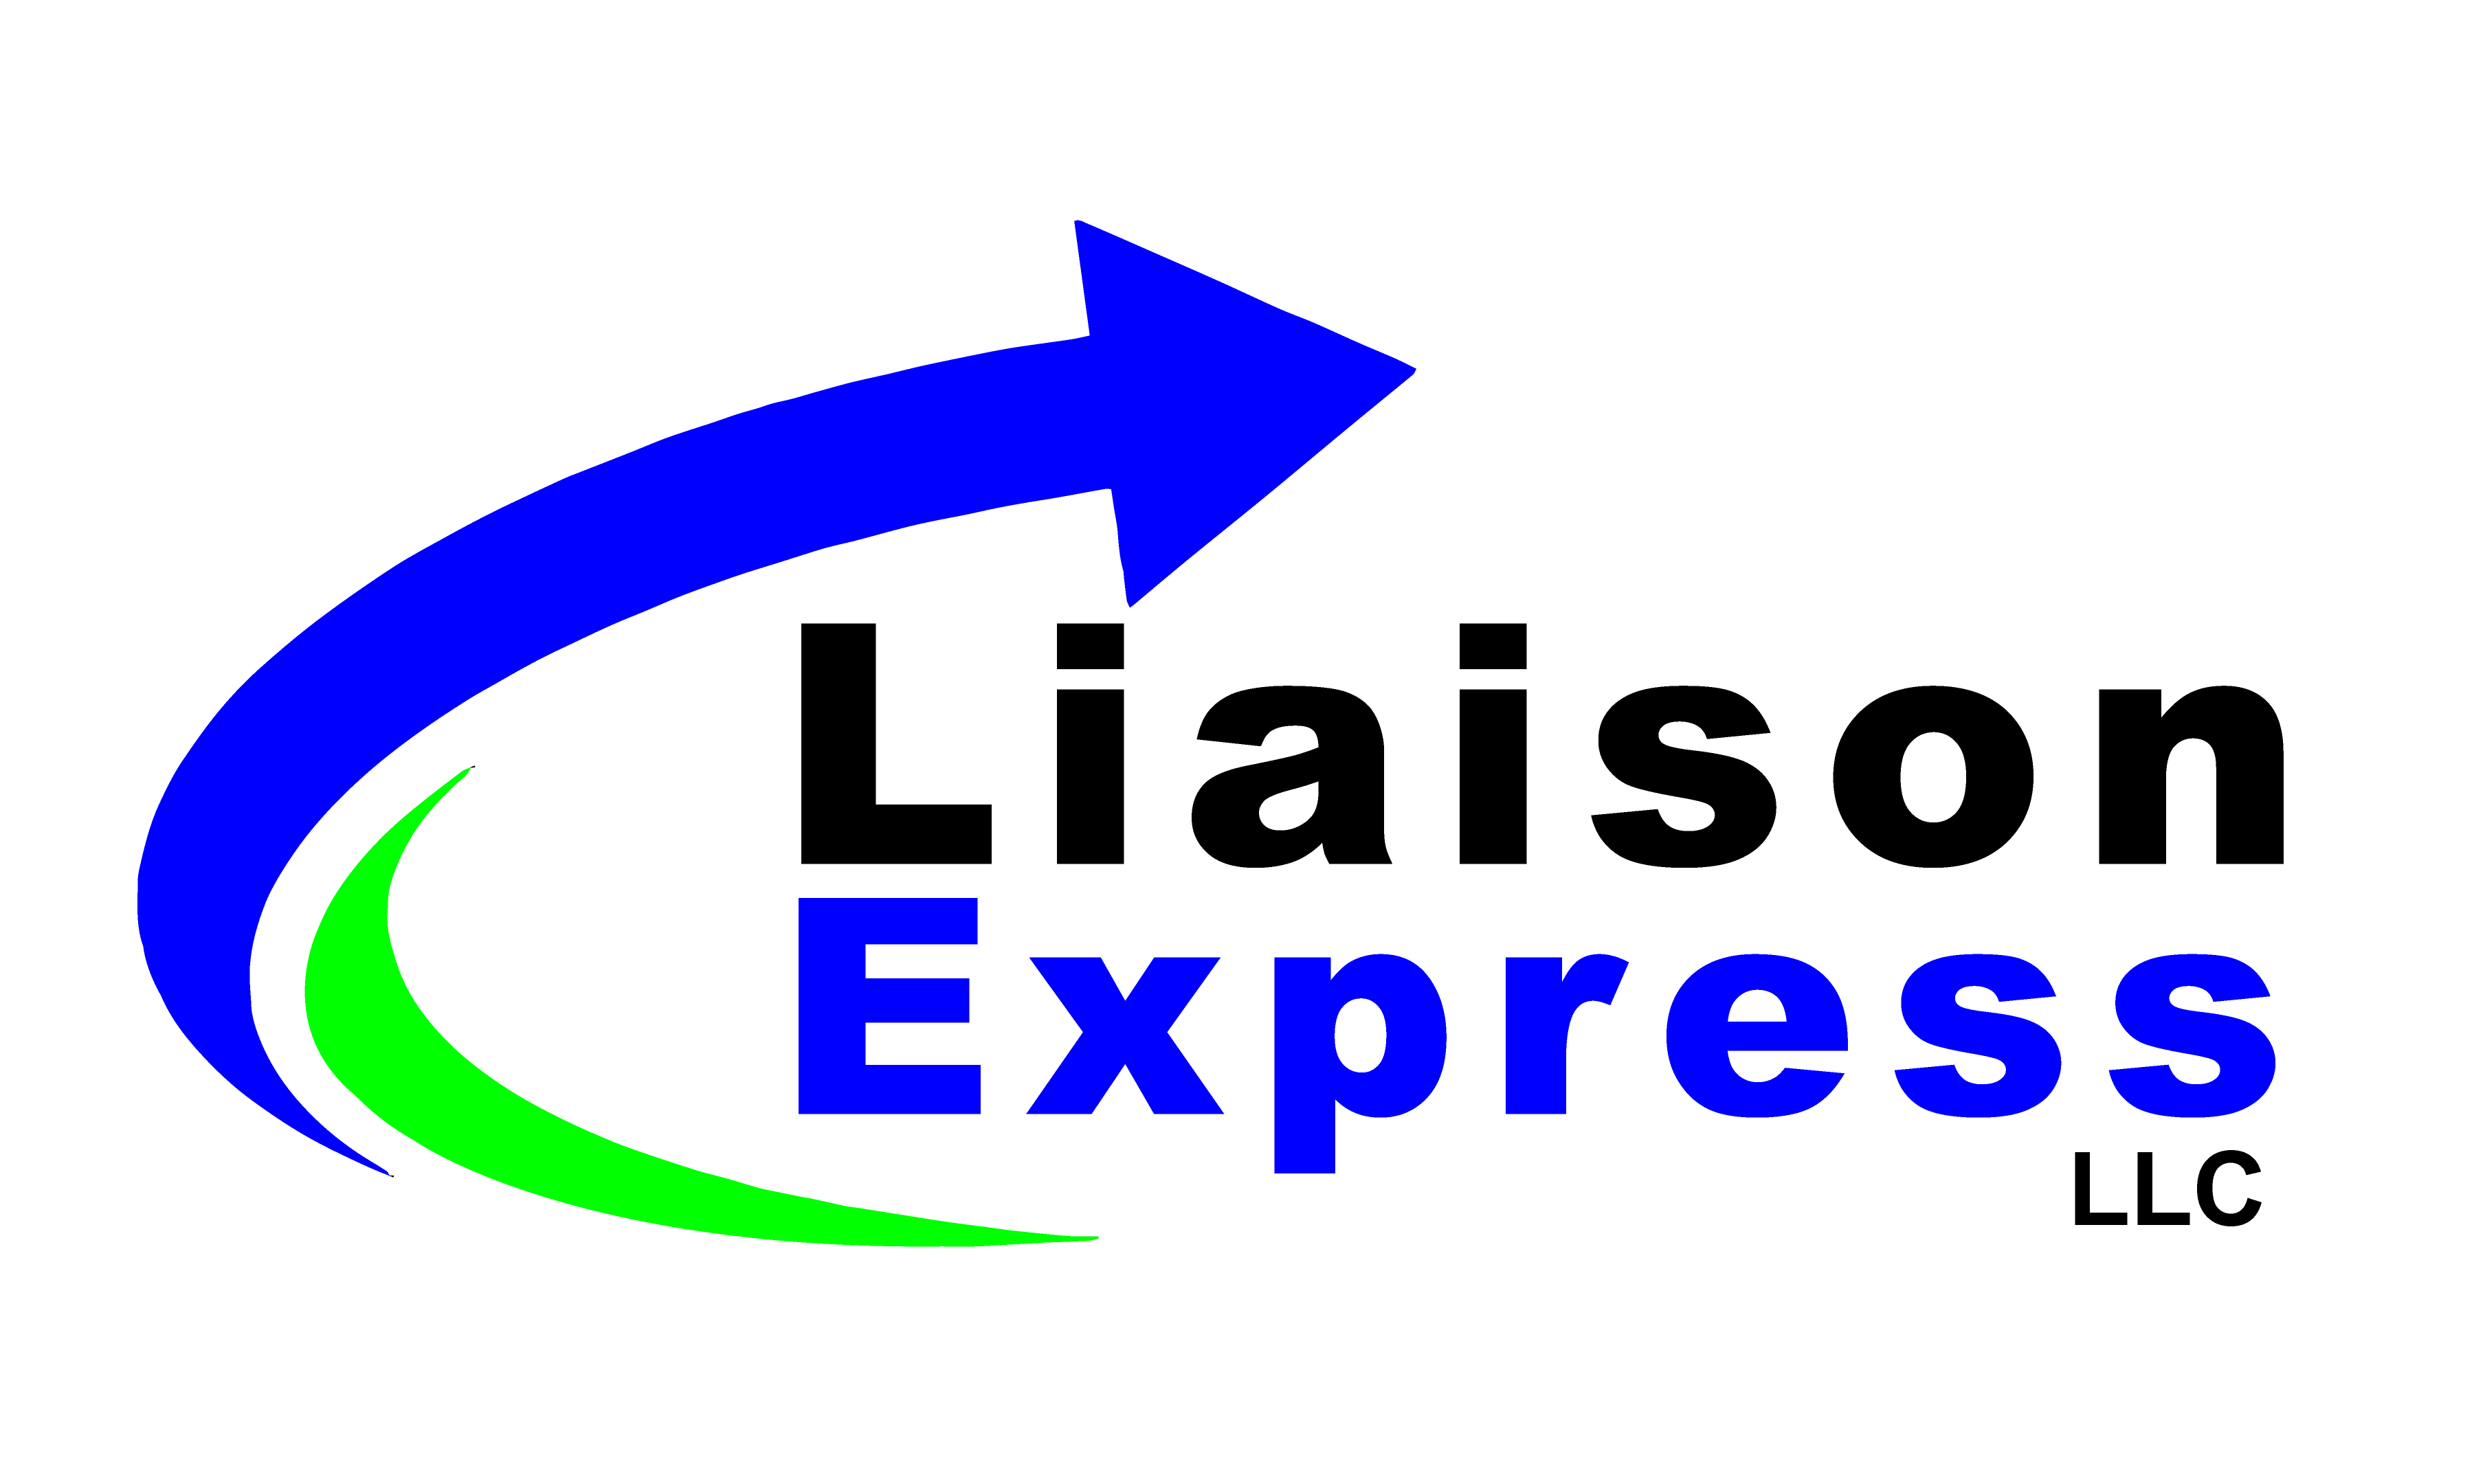 Liaison Express